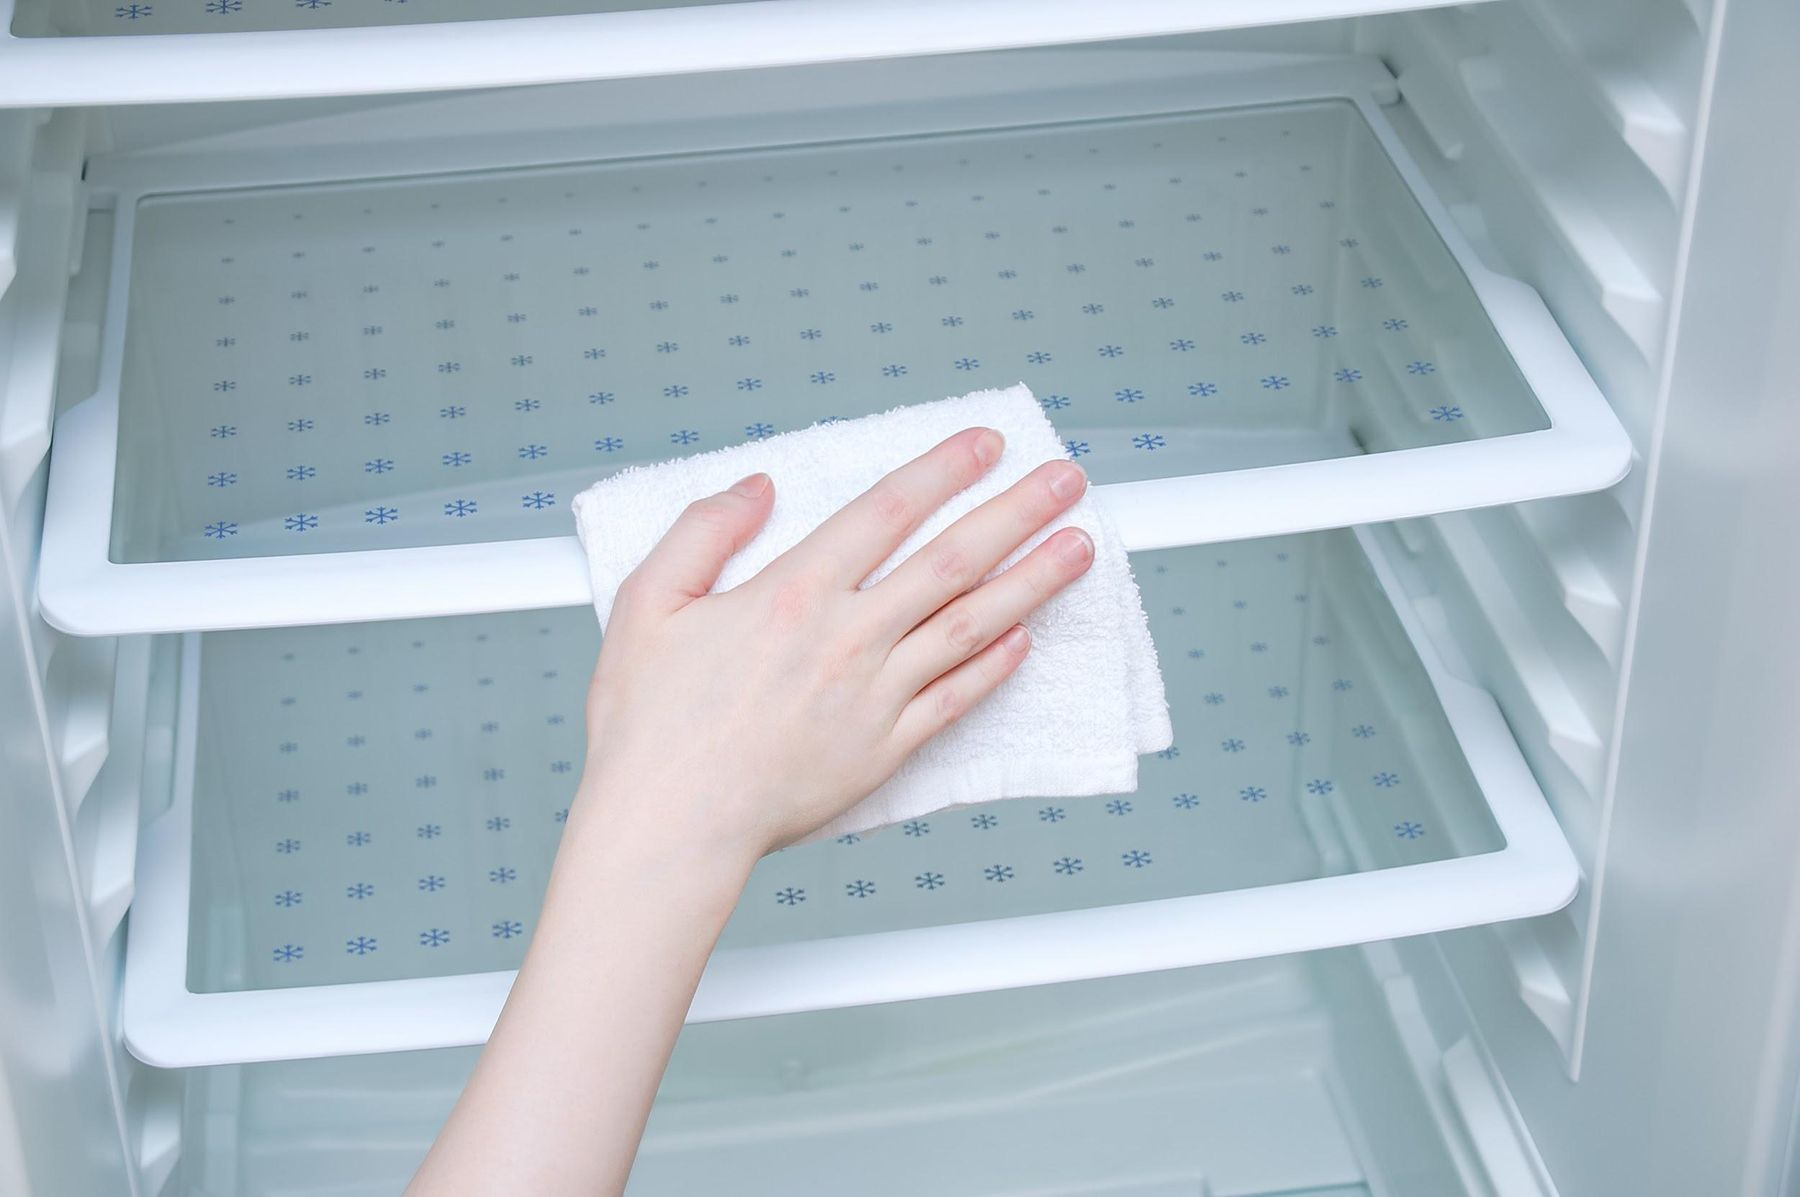 Step 1: Limpiá la heladera